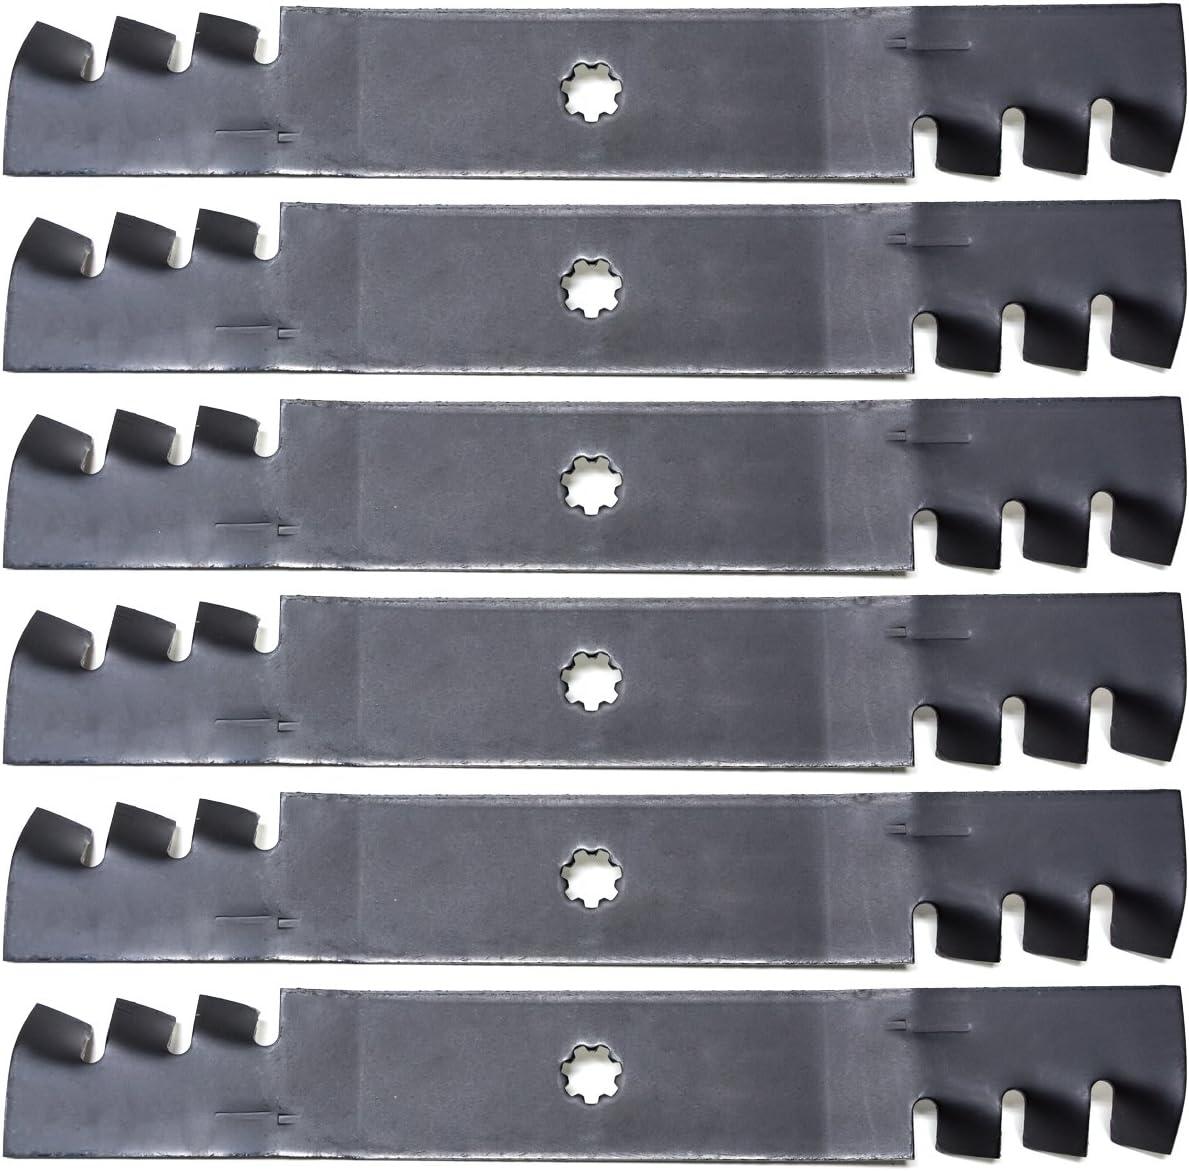 6PK Lawn Mower Blades John Deere GY20852 GX21784 LA140 LA145 LA165 D140 D150 160